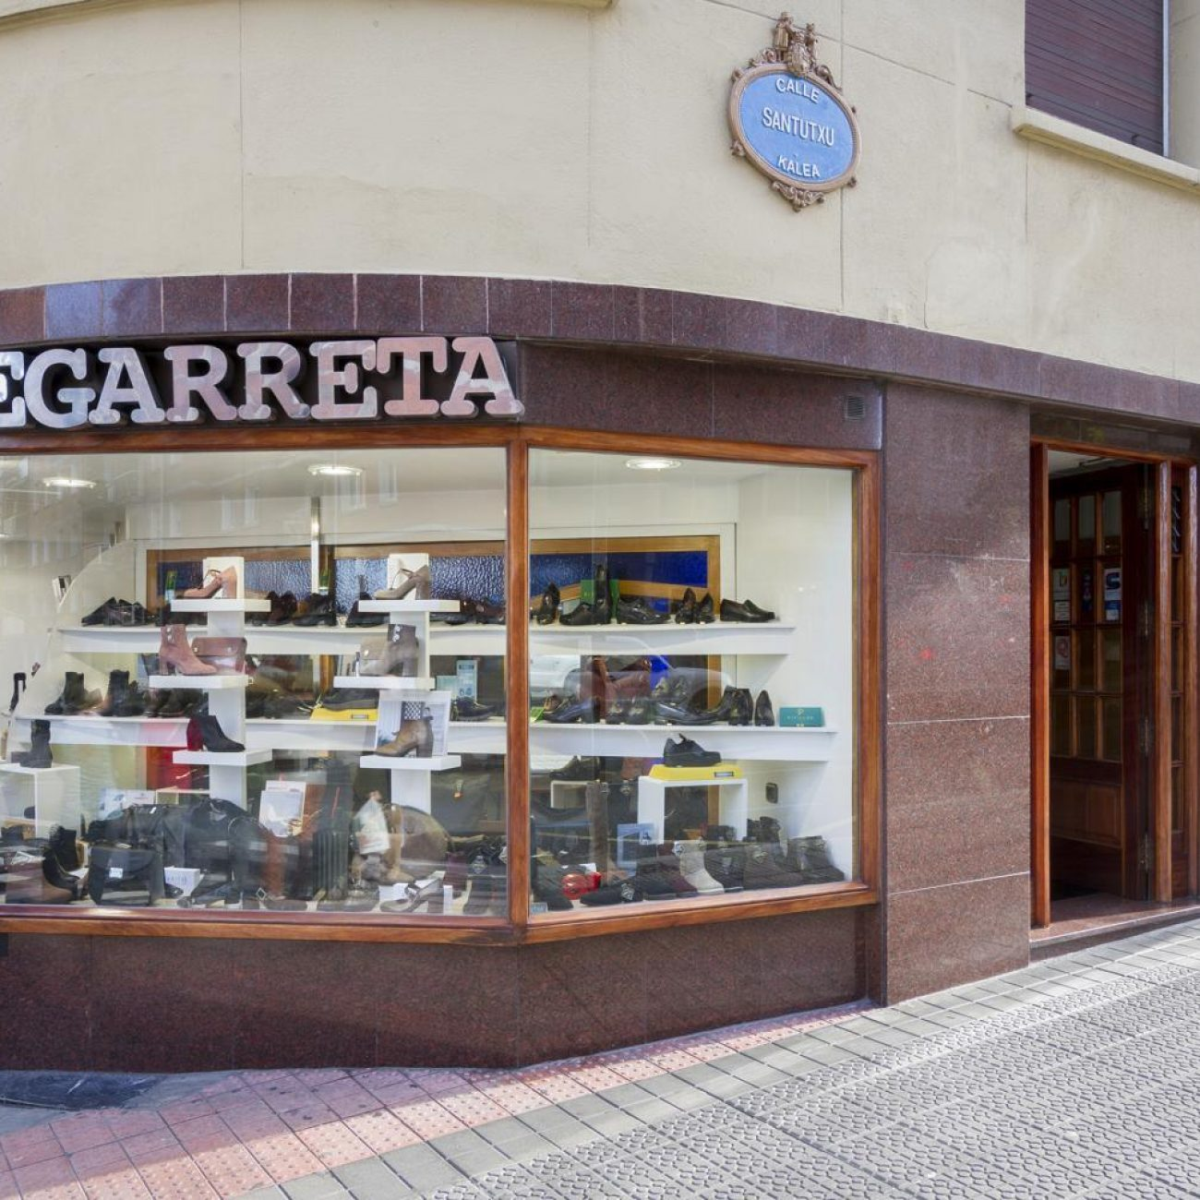 4571-calzados-legarreta-01